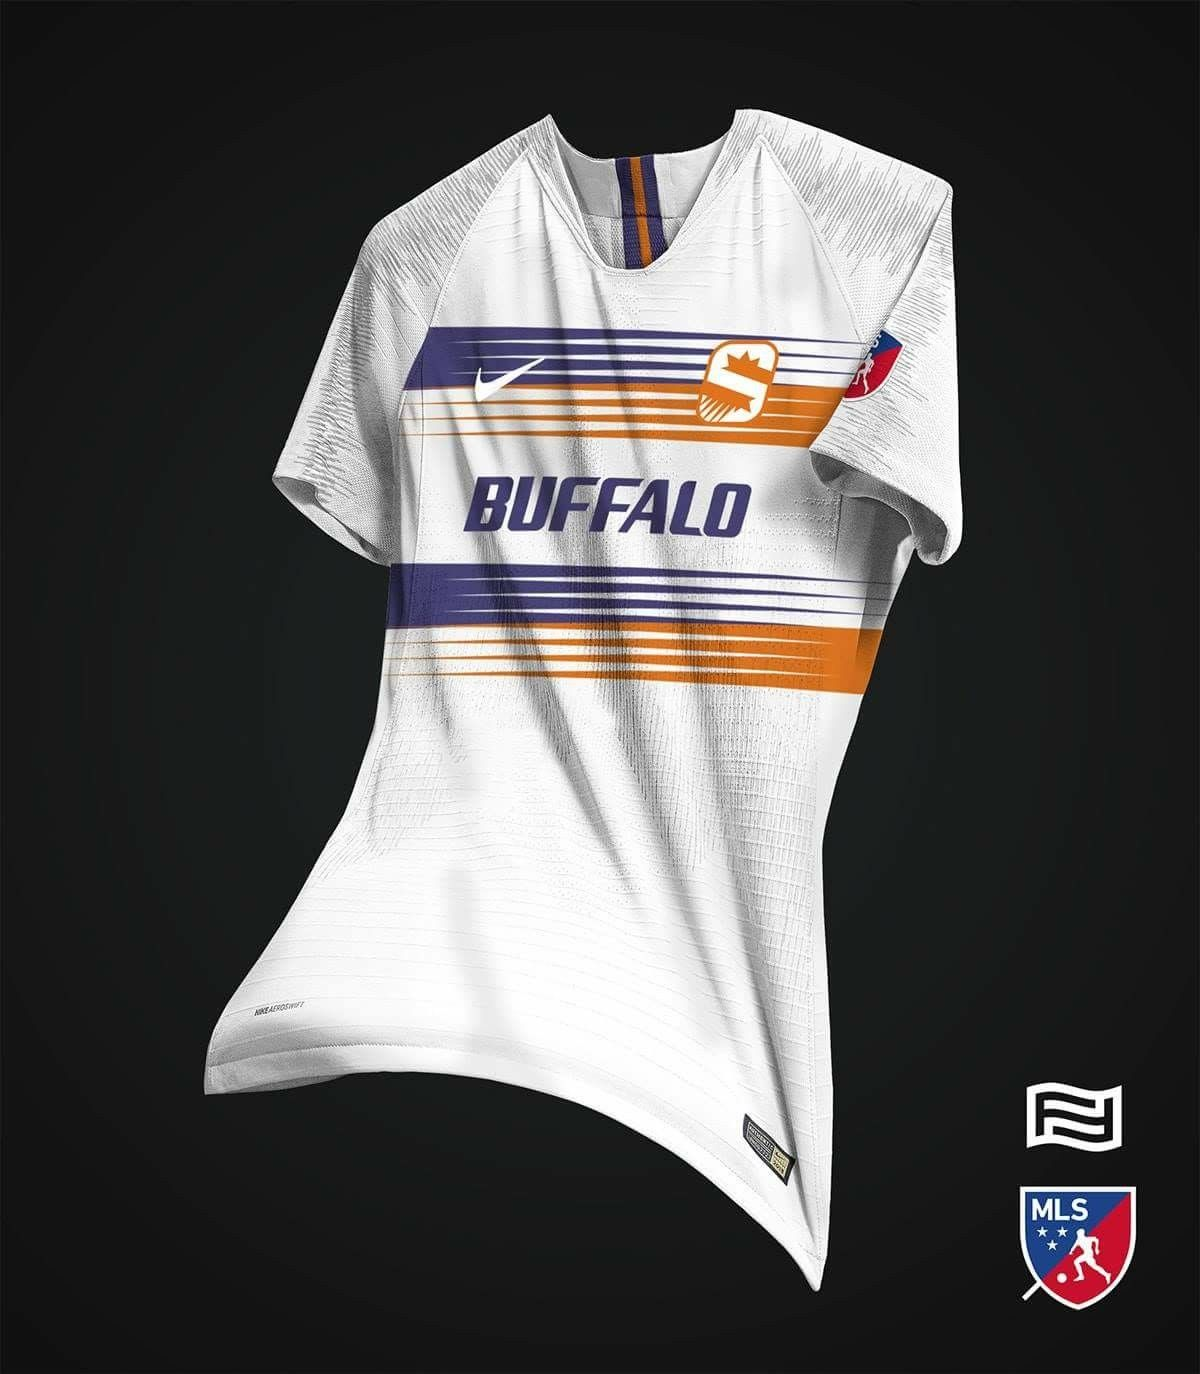 Pin De Dhavii Alhaziiq En Kits Jersey Camisetas Deportivas Camisa De Futbol Camisetas De Futbol